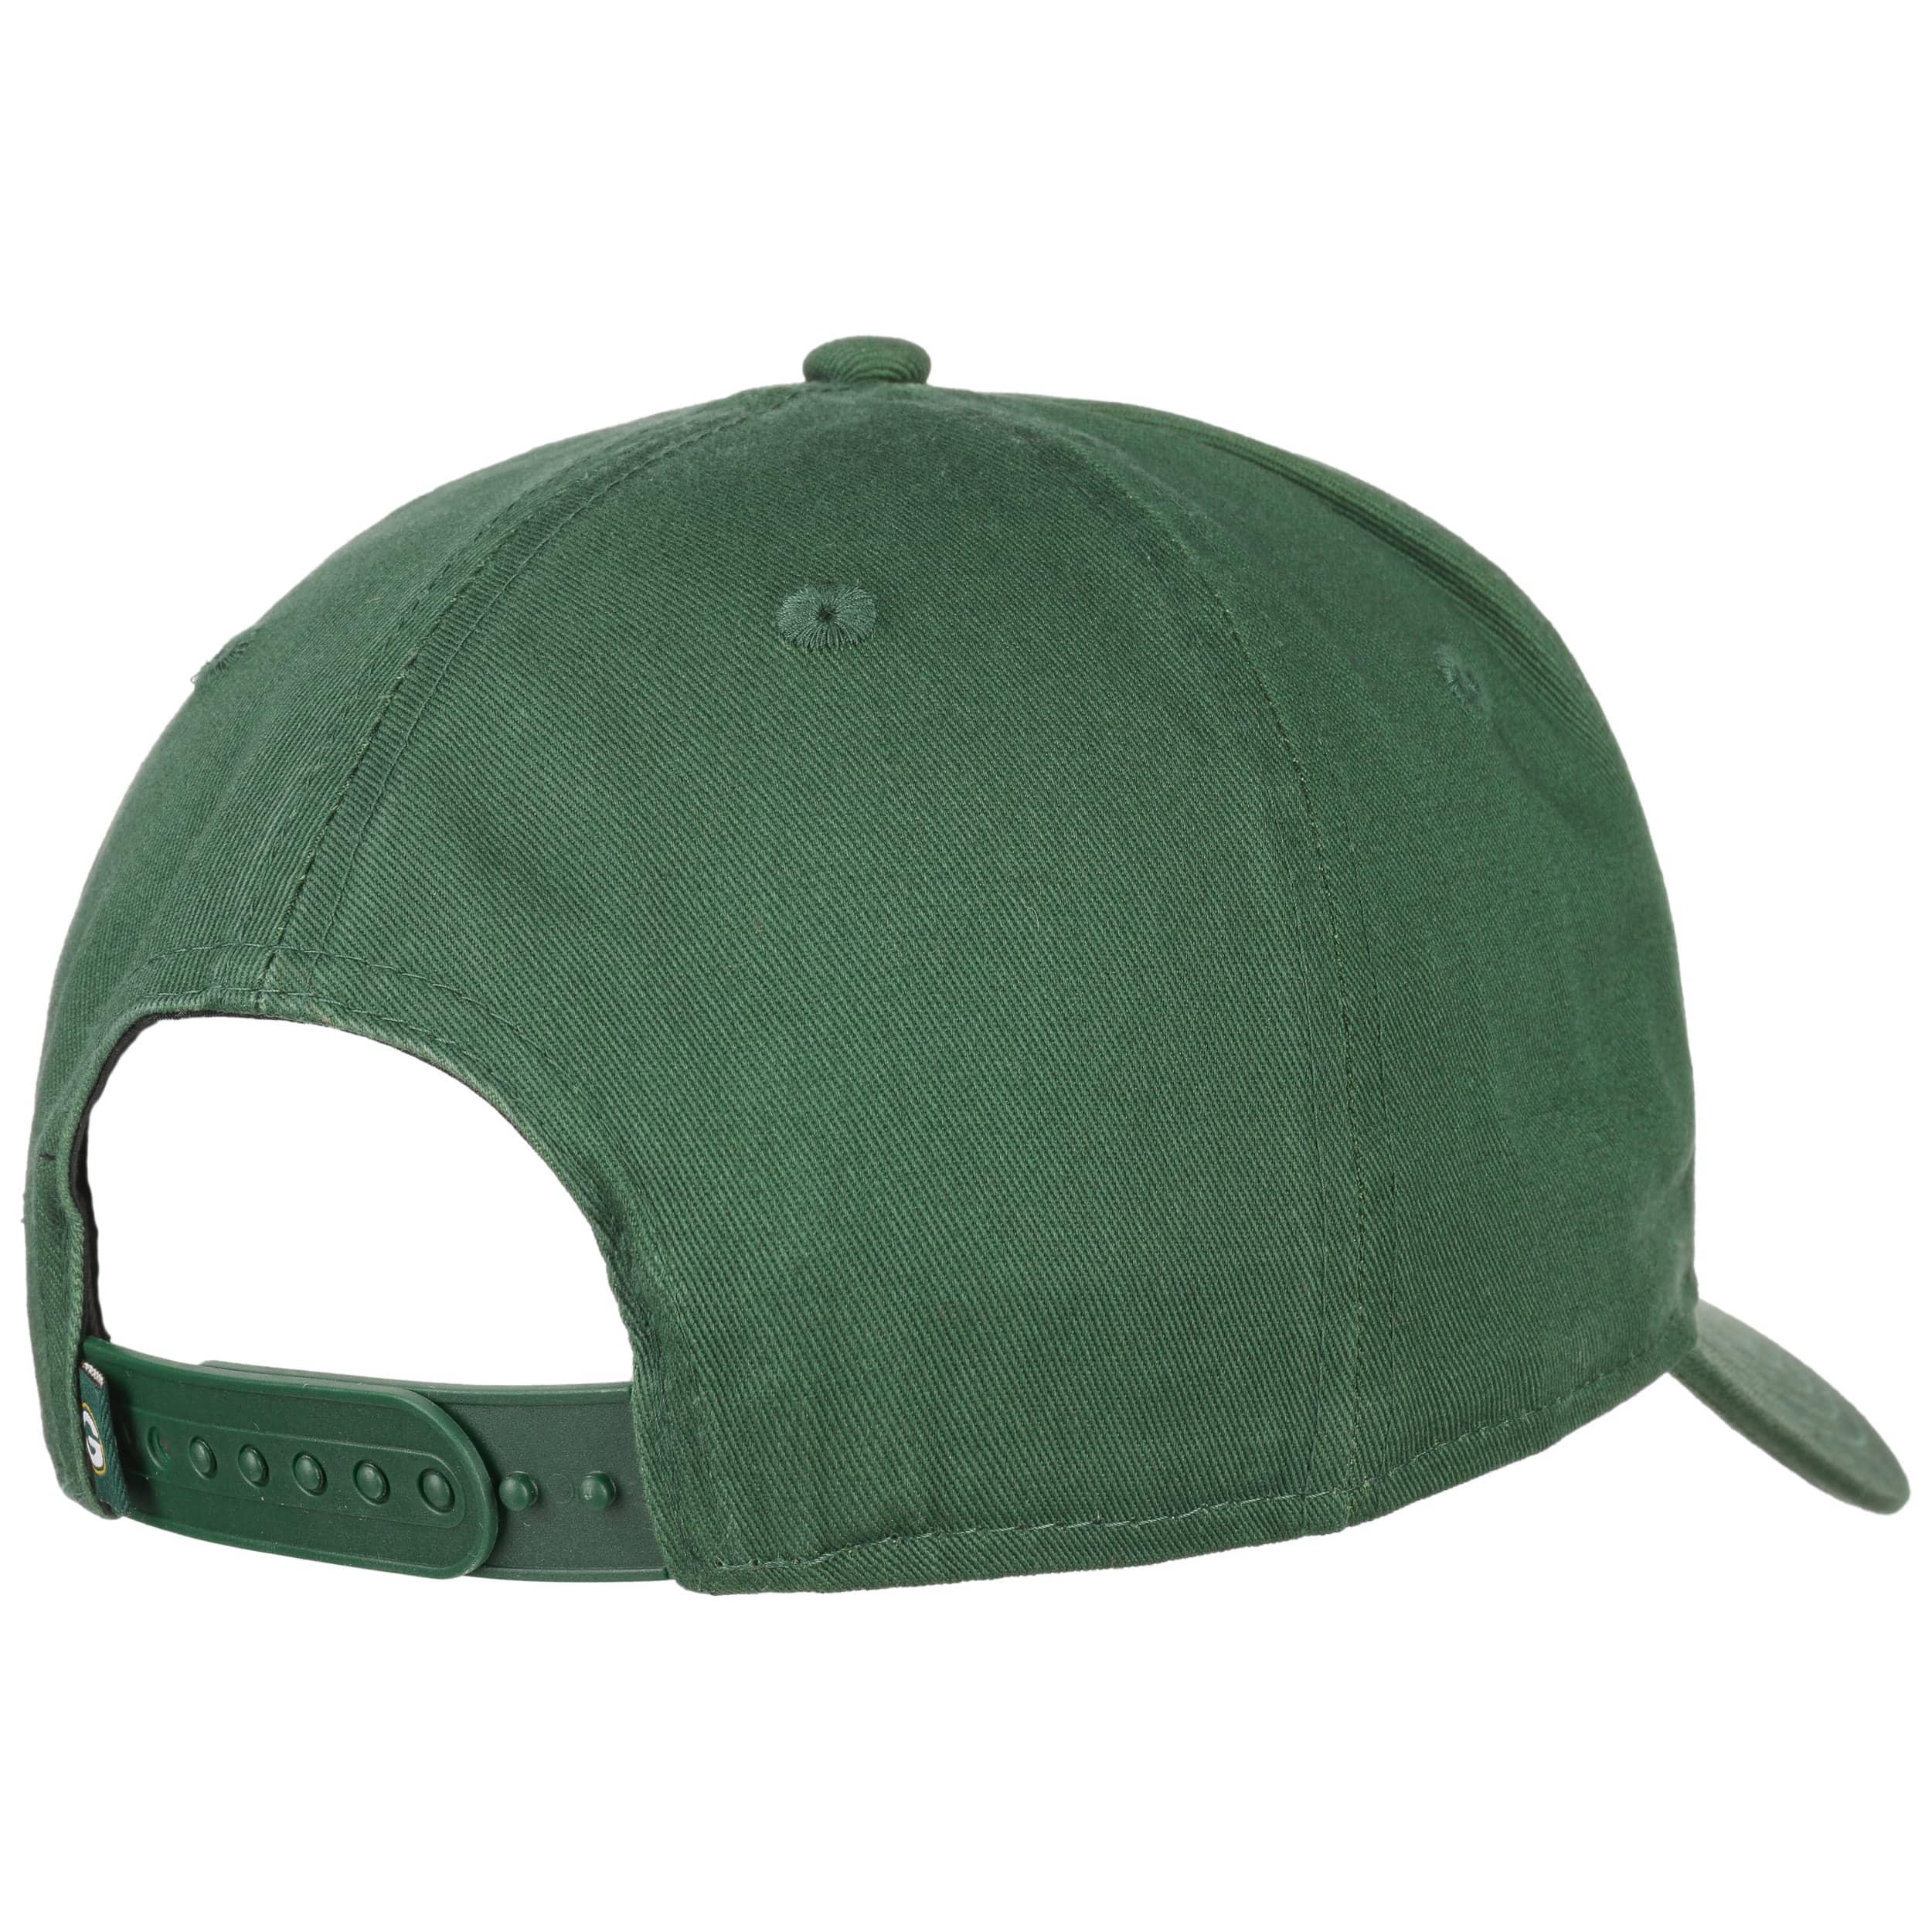 New Era USA Patch Trucker Curve Peak Summer Green Hat Cap